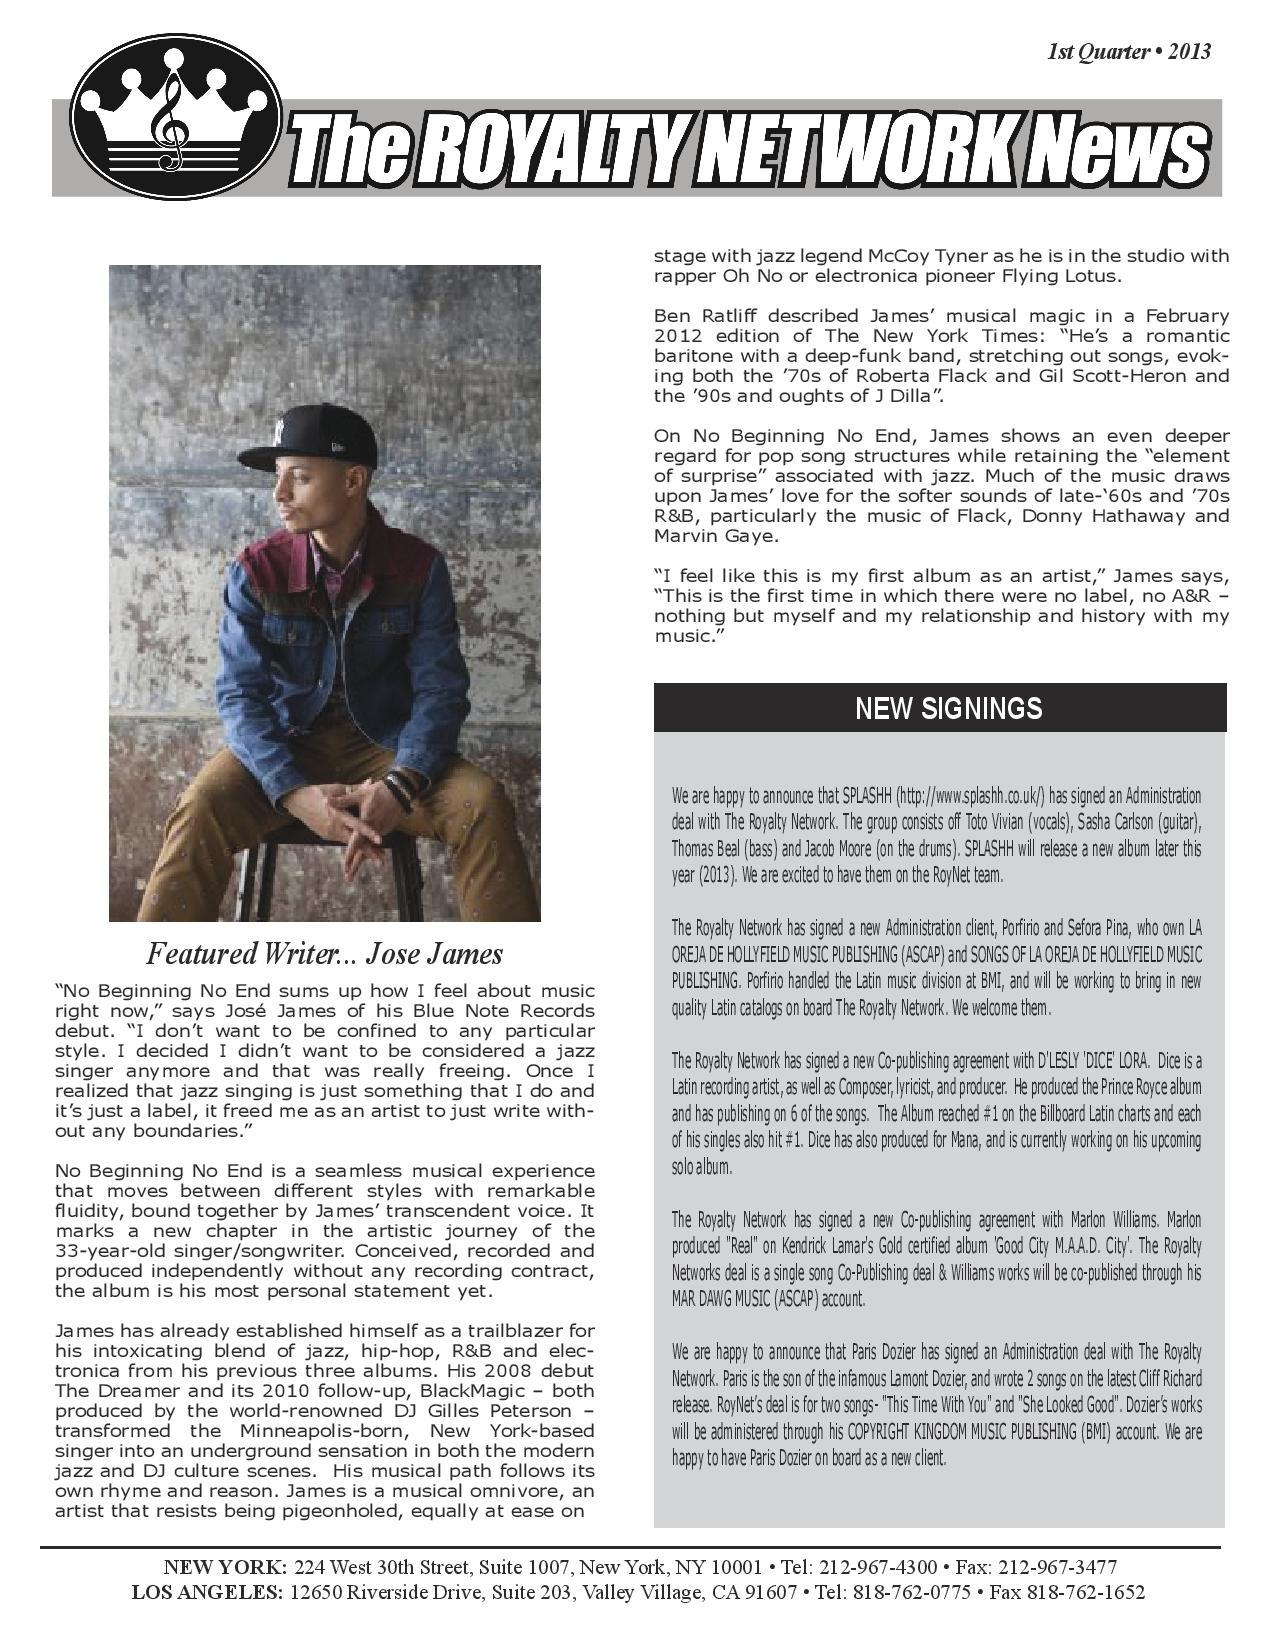 1st Quarter 2013 Edition of the Royalty Newtork News.